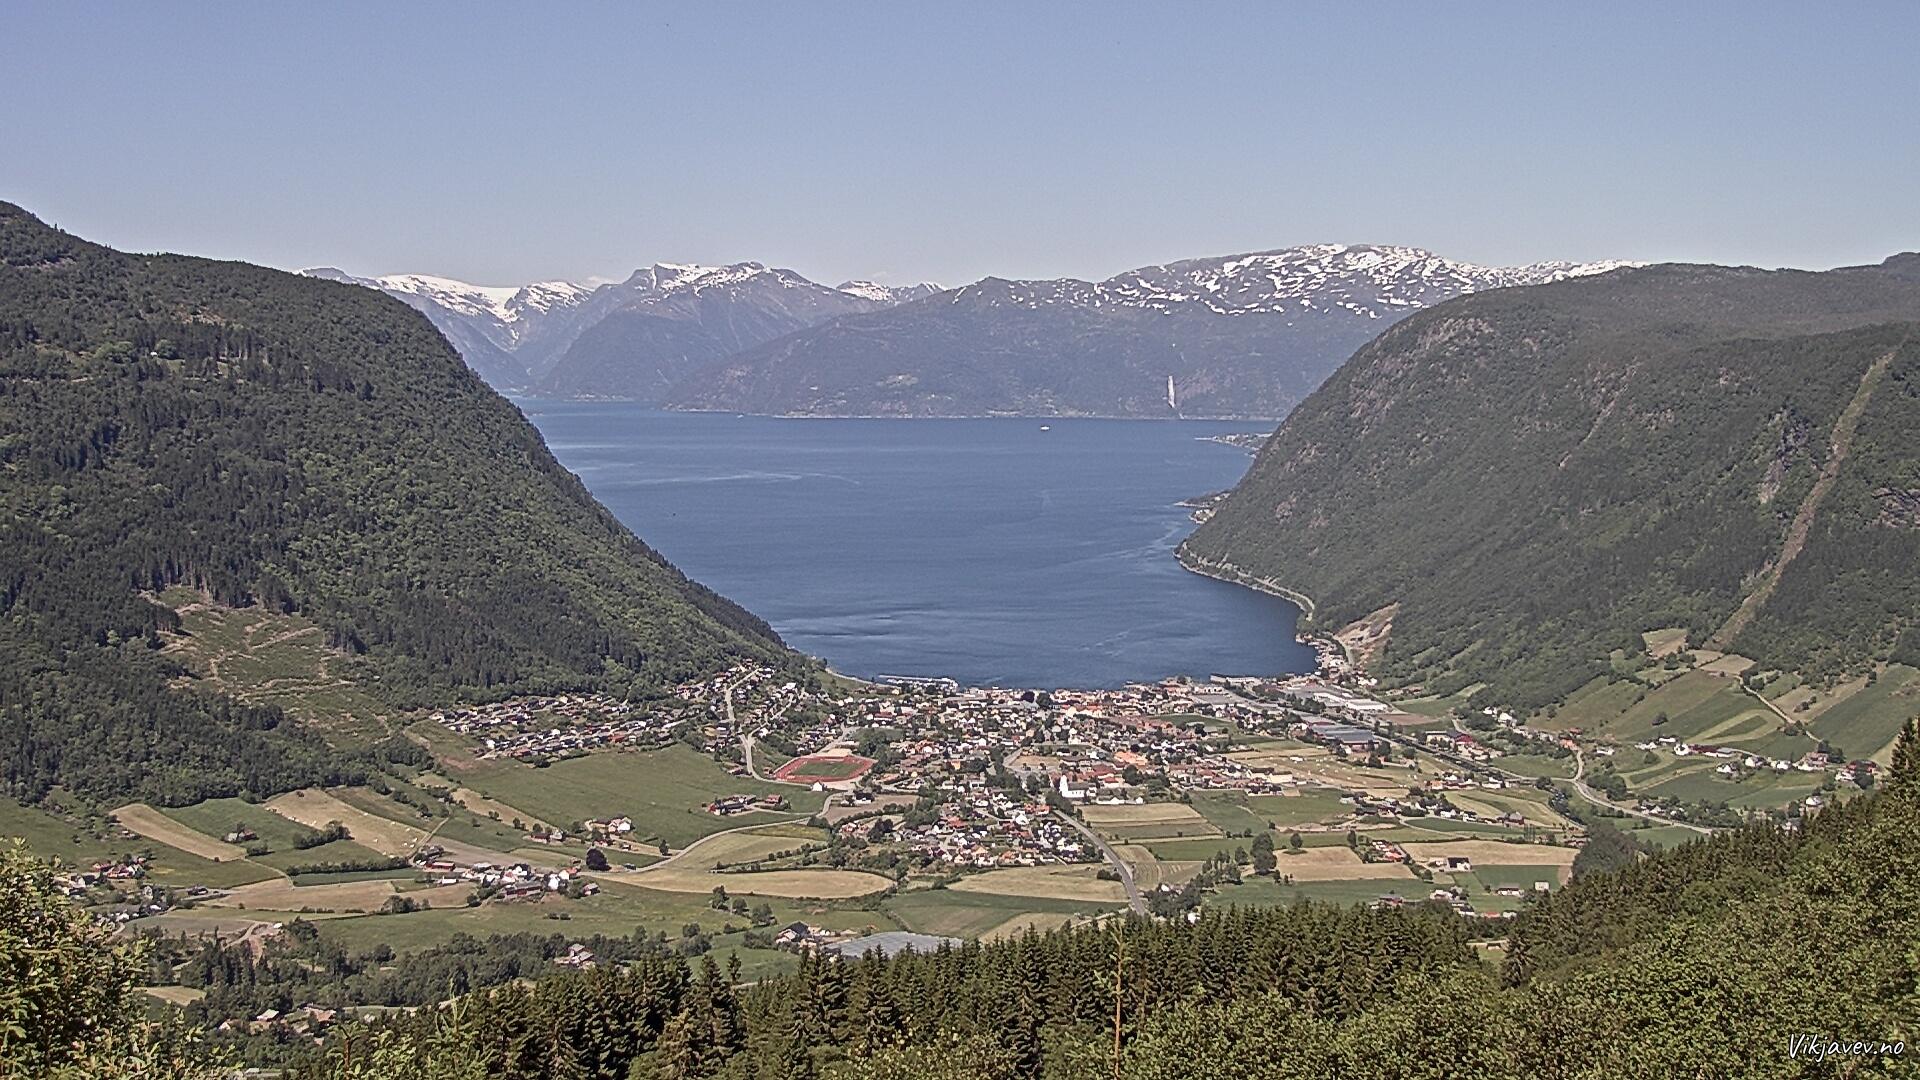 Vik i Sogn 4. juni 2018 15:00